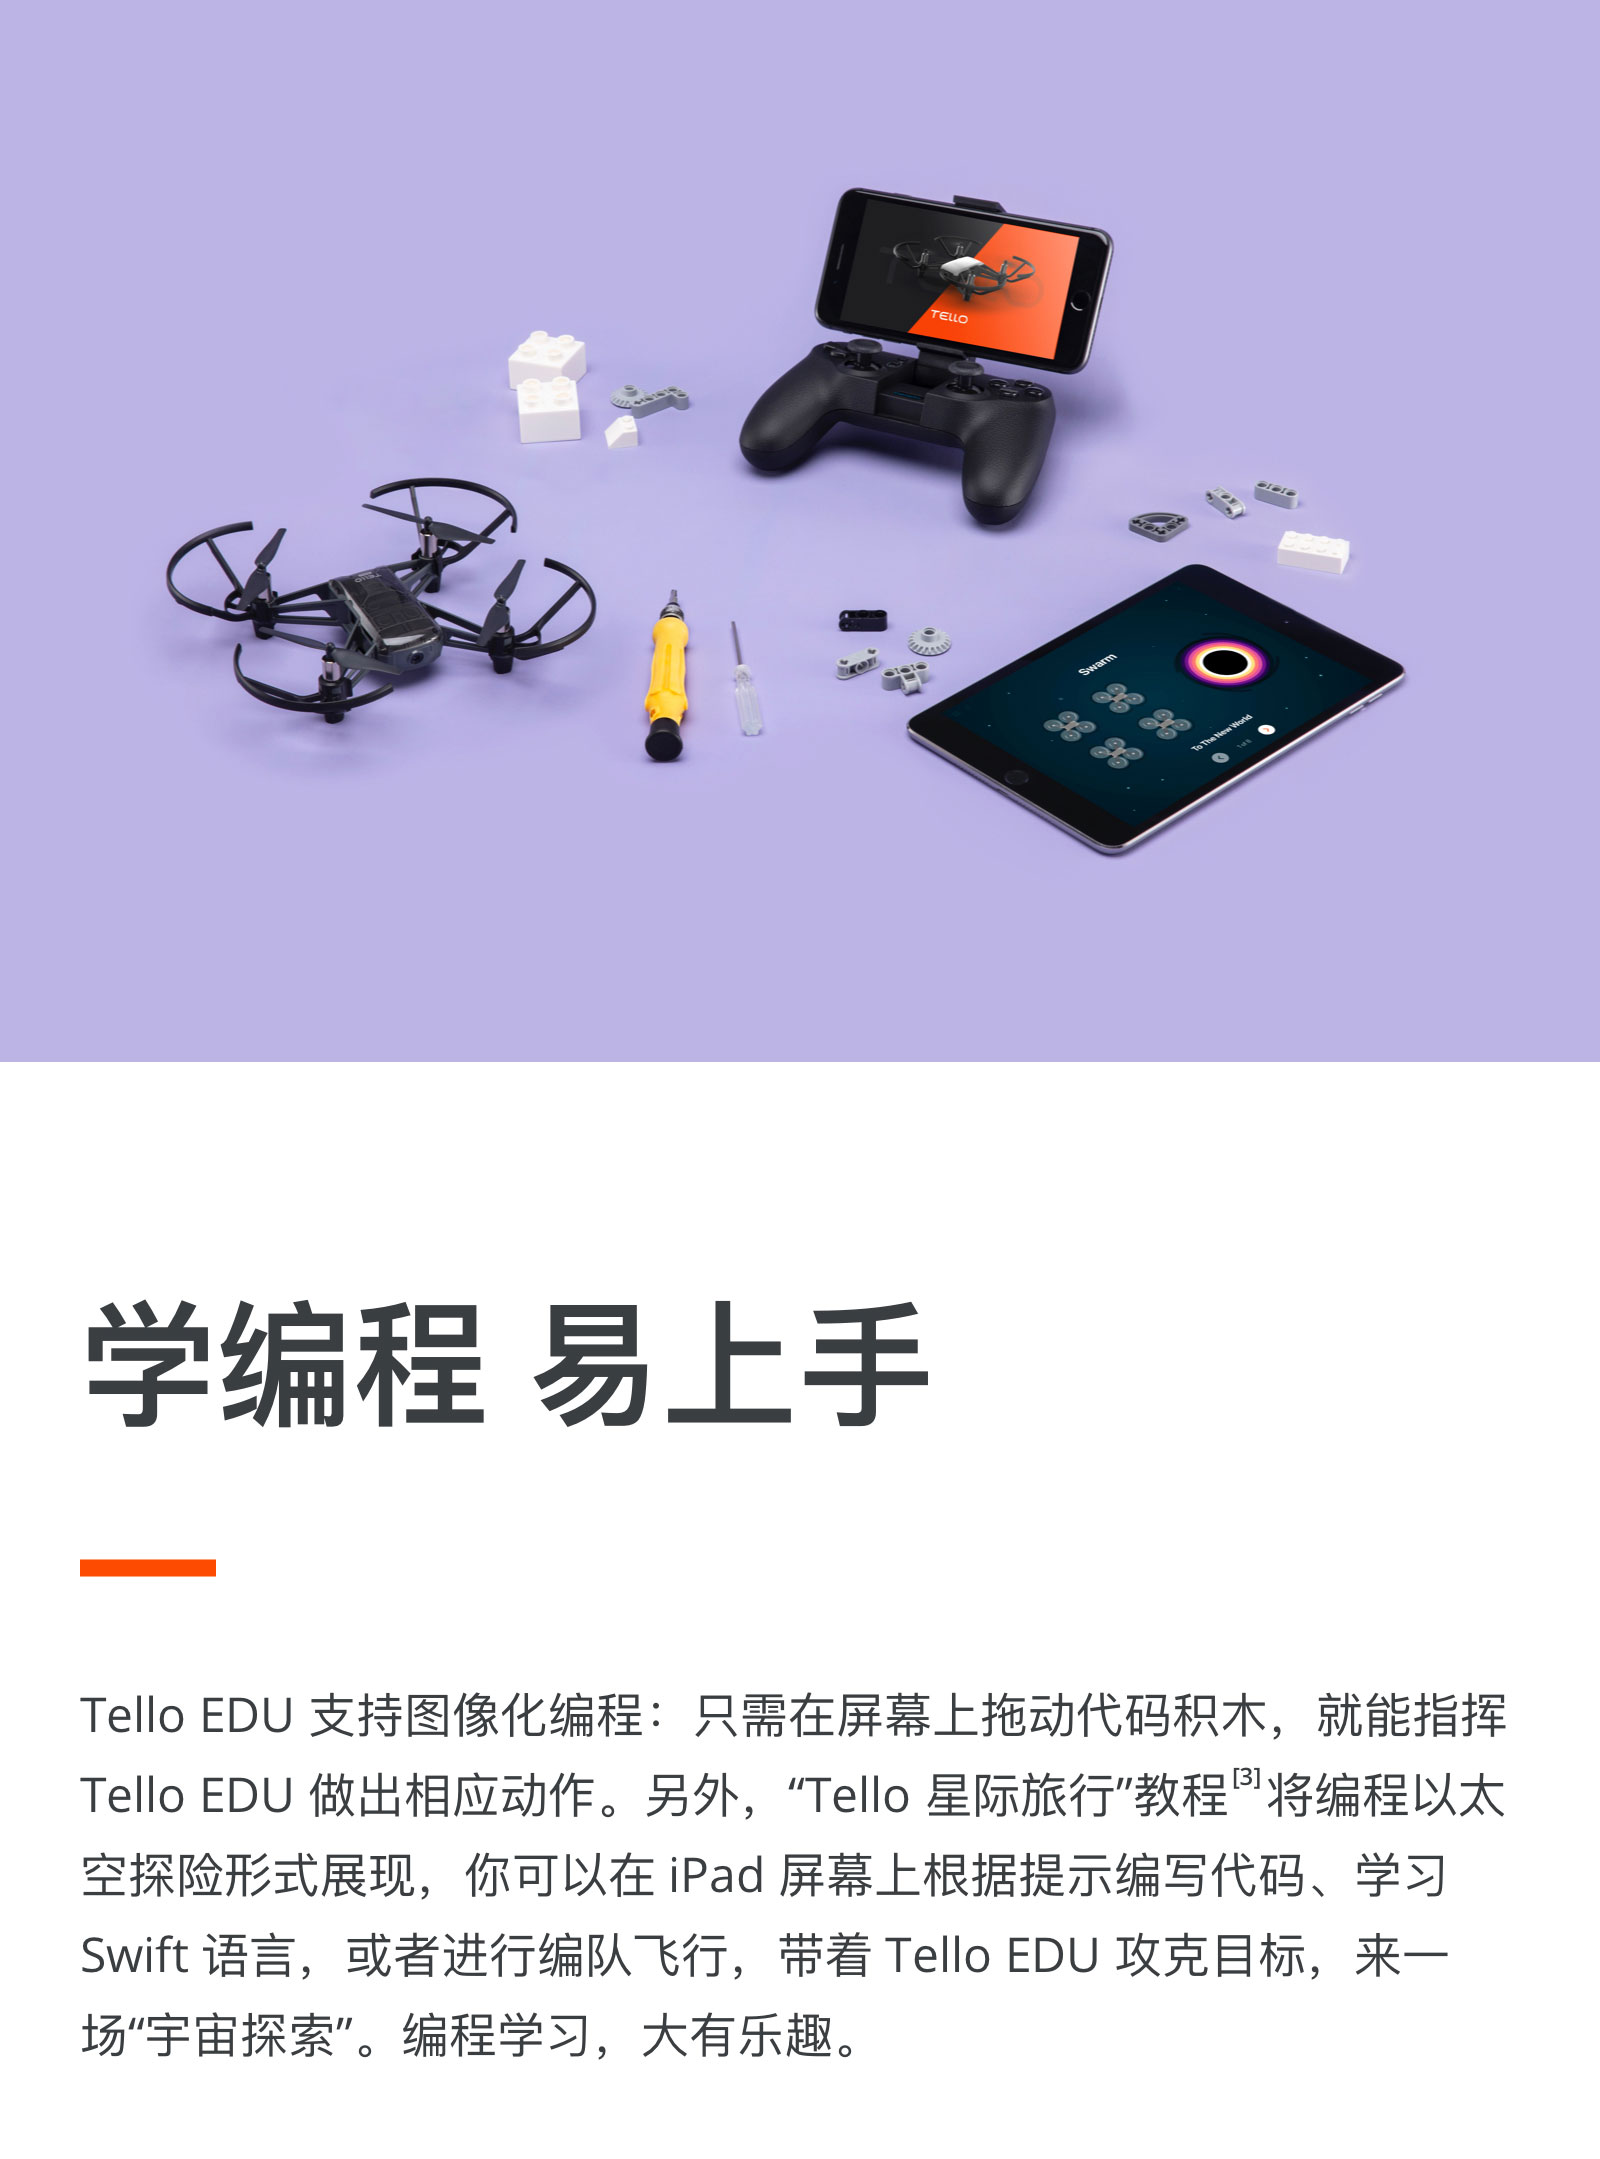 tello-edu-cn-m800-copy_06.jpg